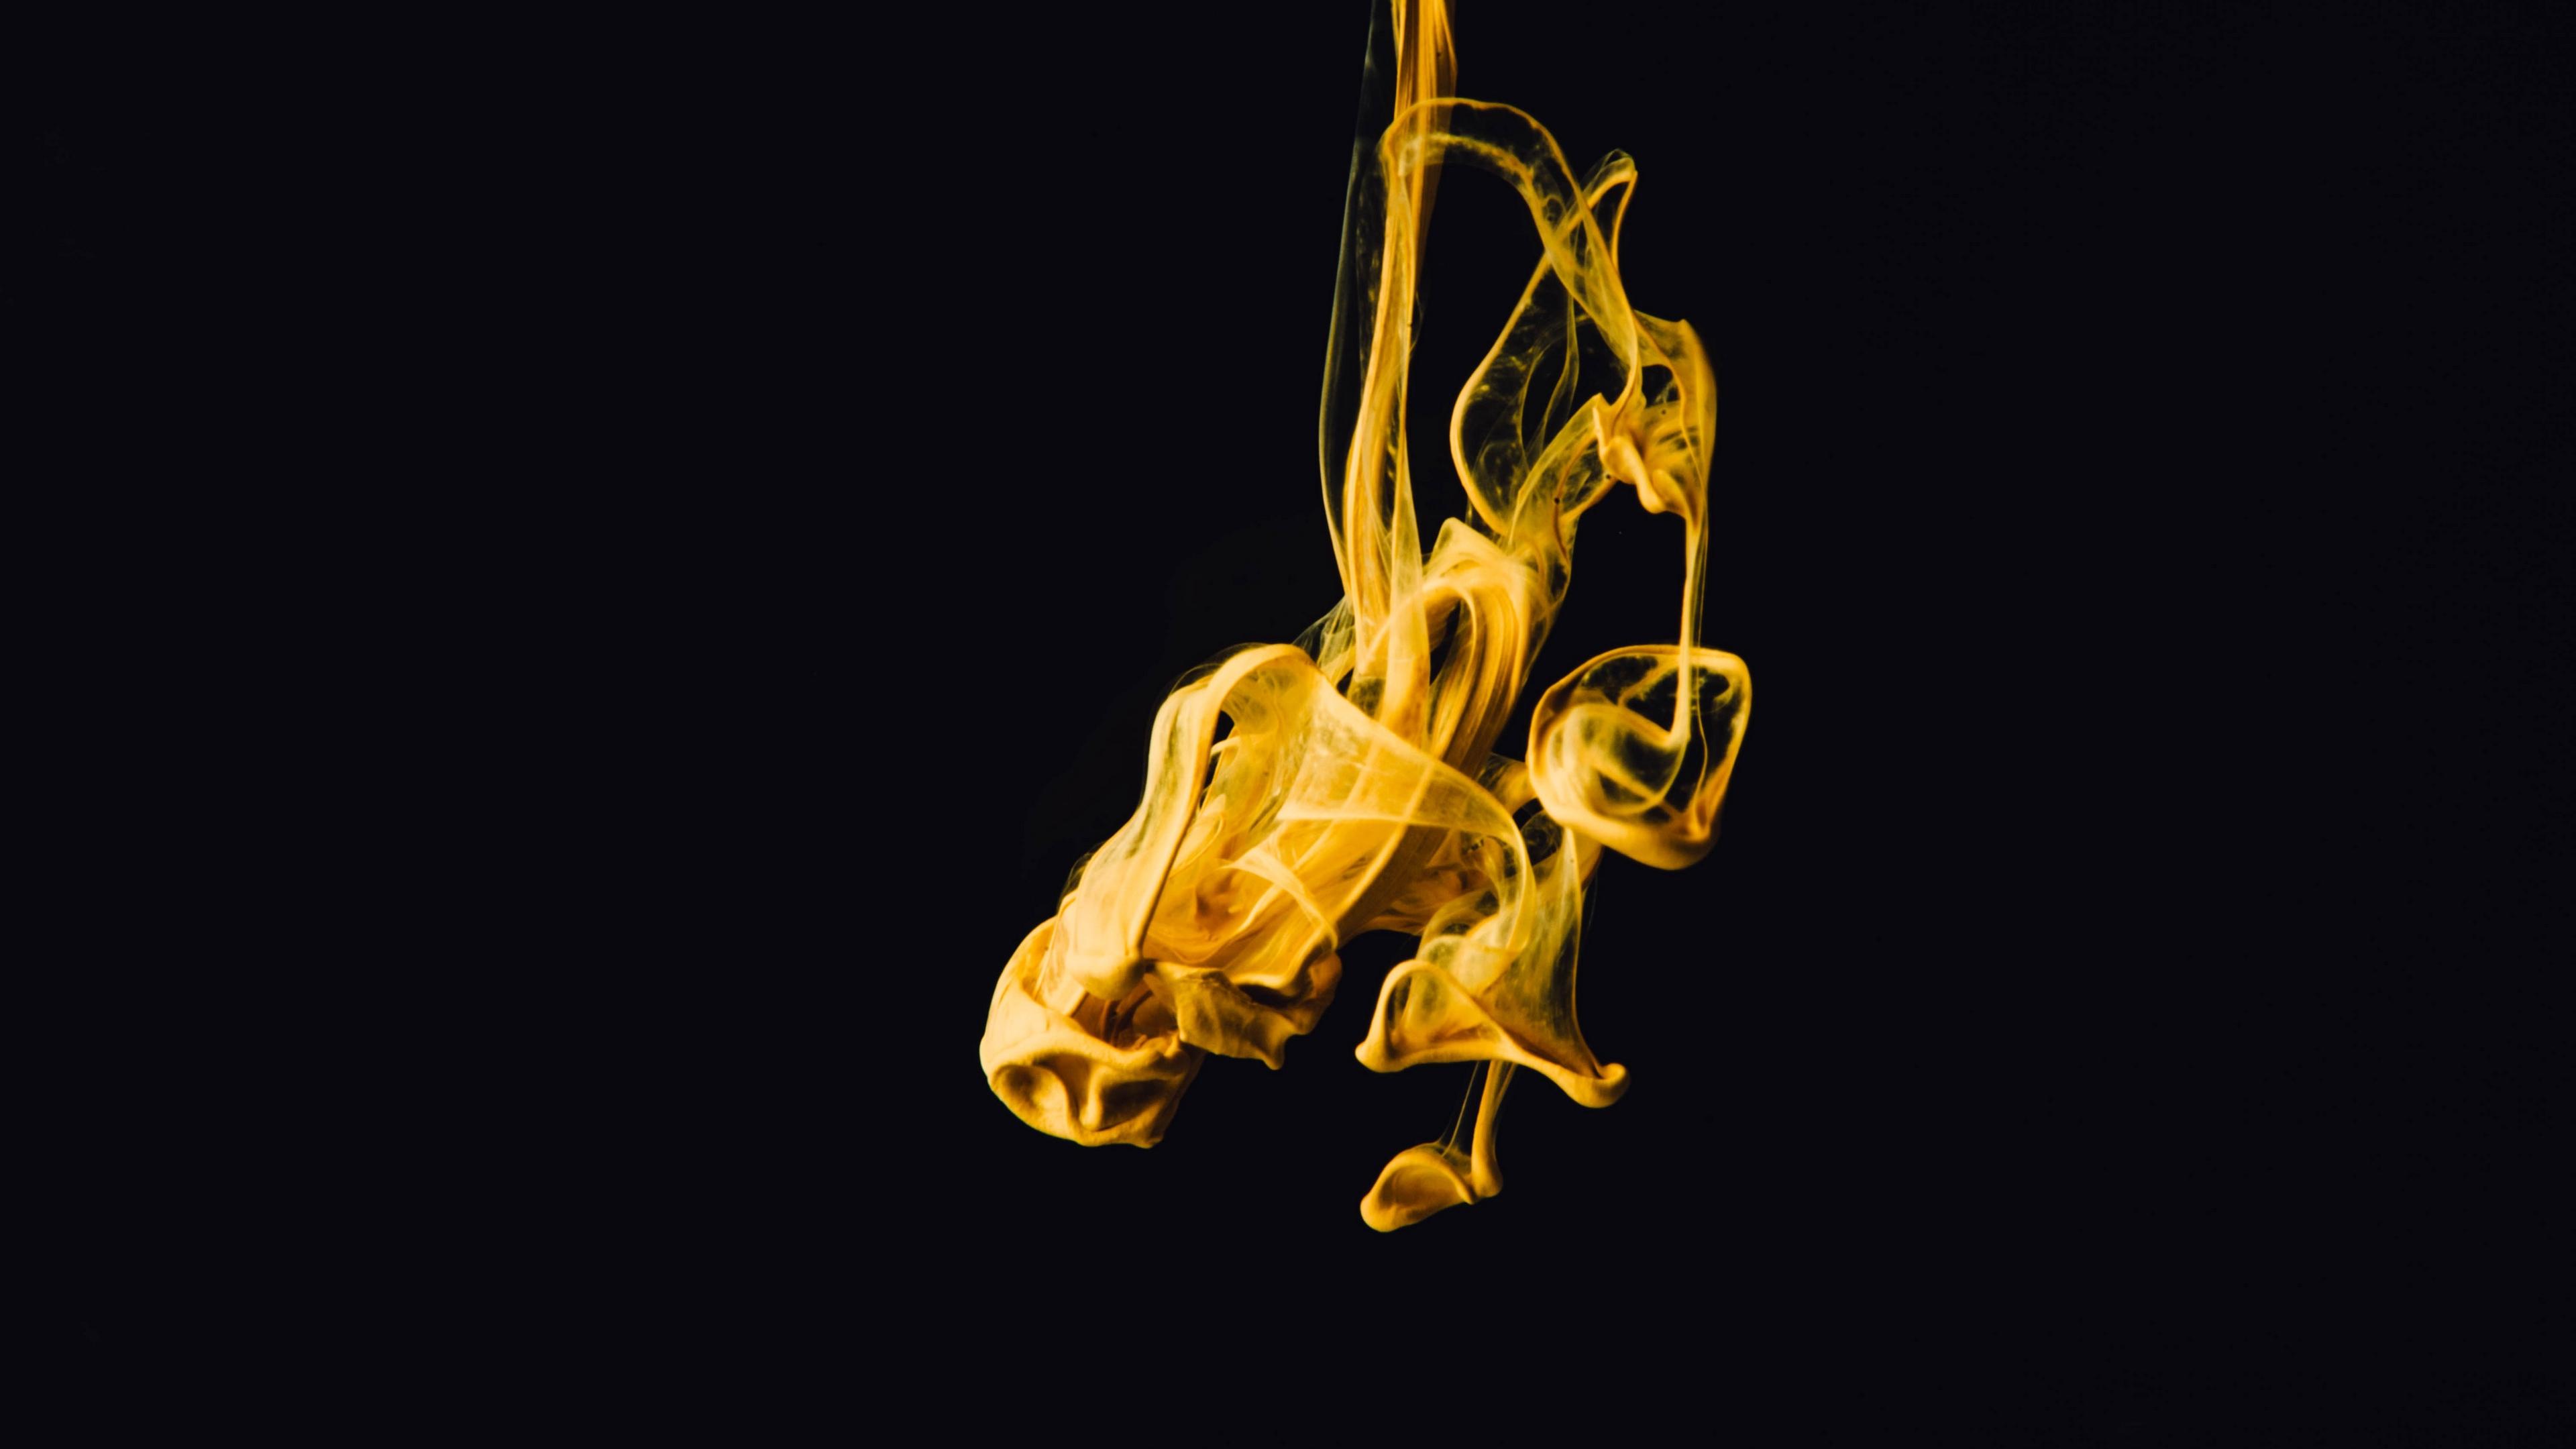 smoke clumps abstract plexus 4k 1539369894 - smoke, clumps, abstract, plexus 4k - Smoke, clumps, abstract